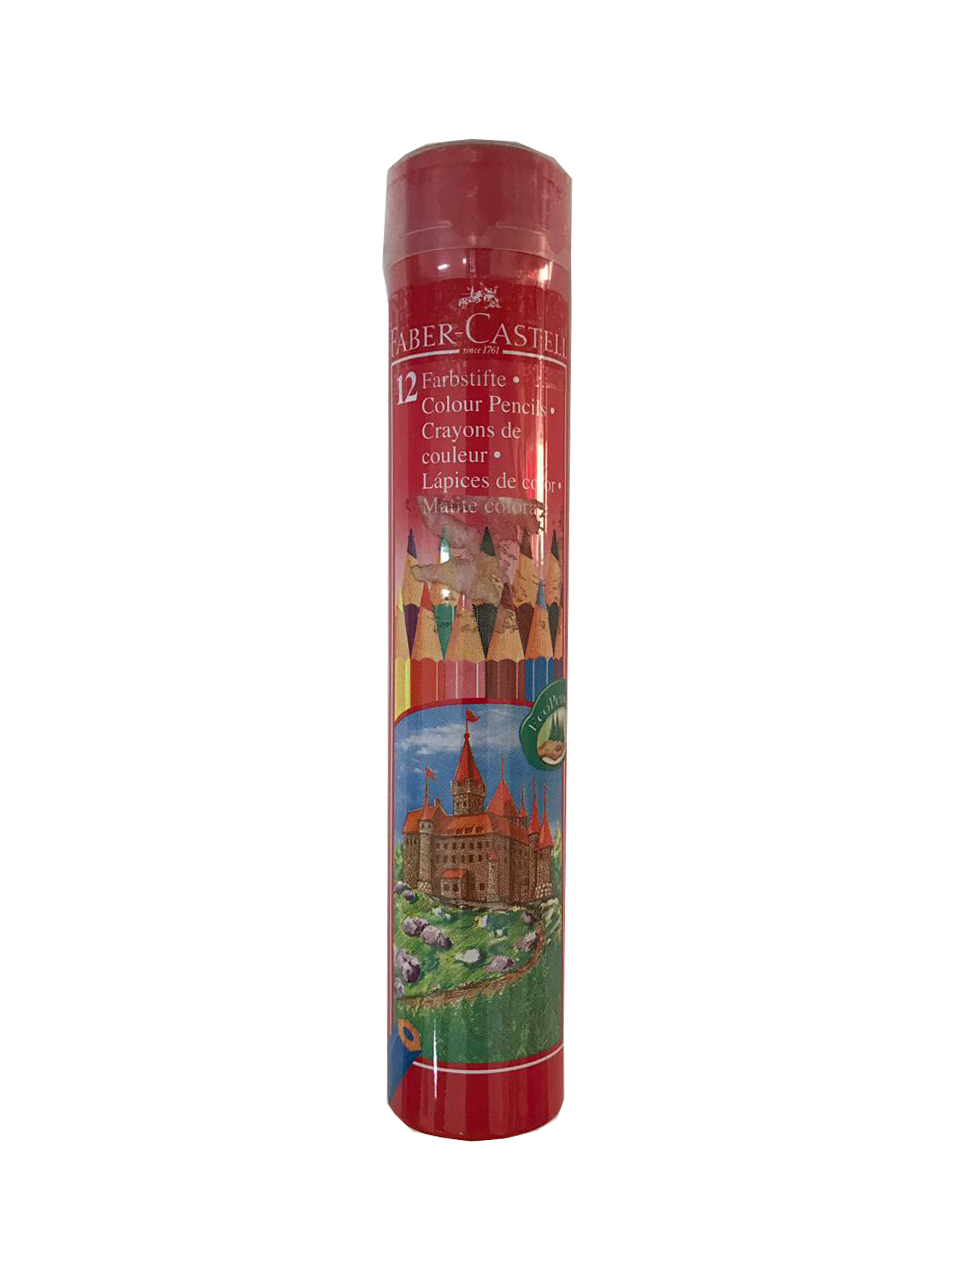 Faber Castell 12 Colour Pencil (round)